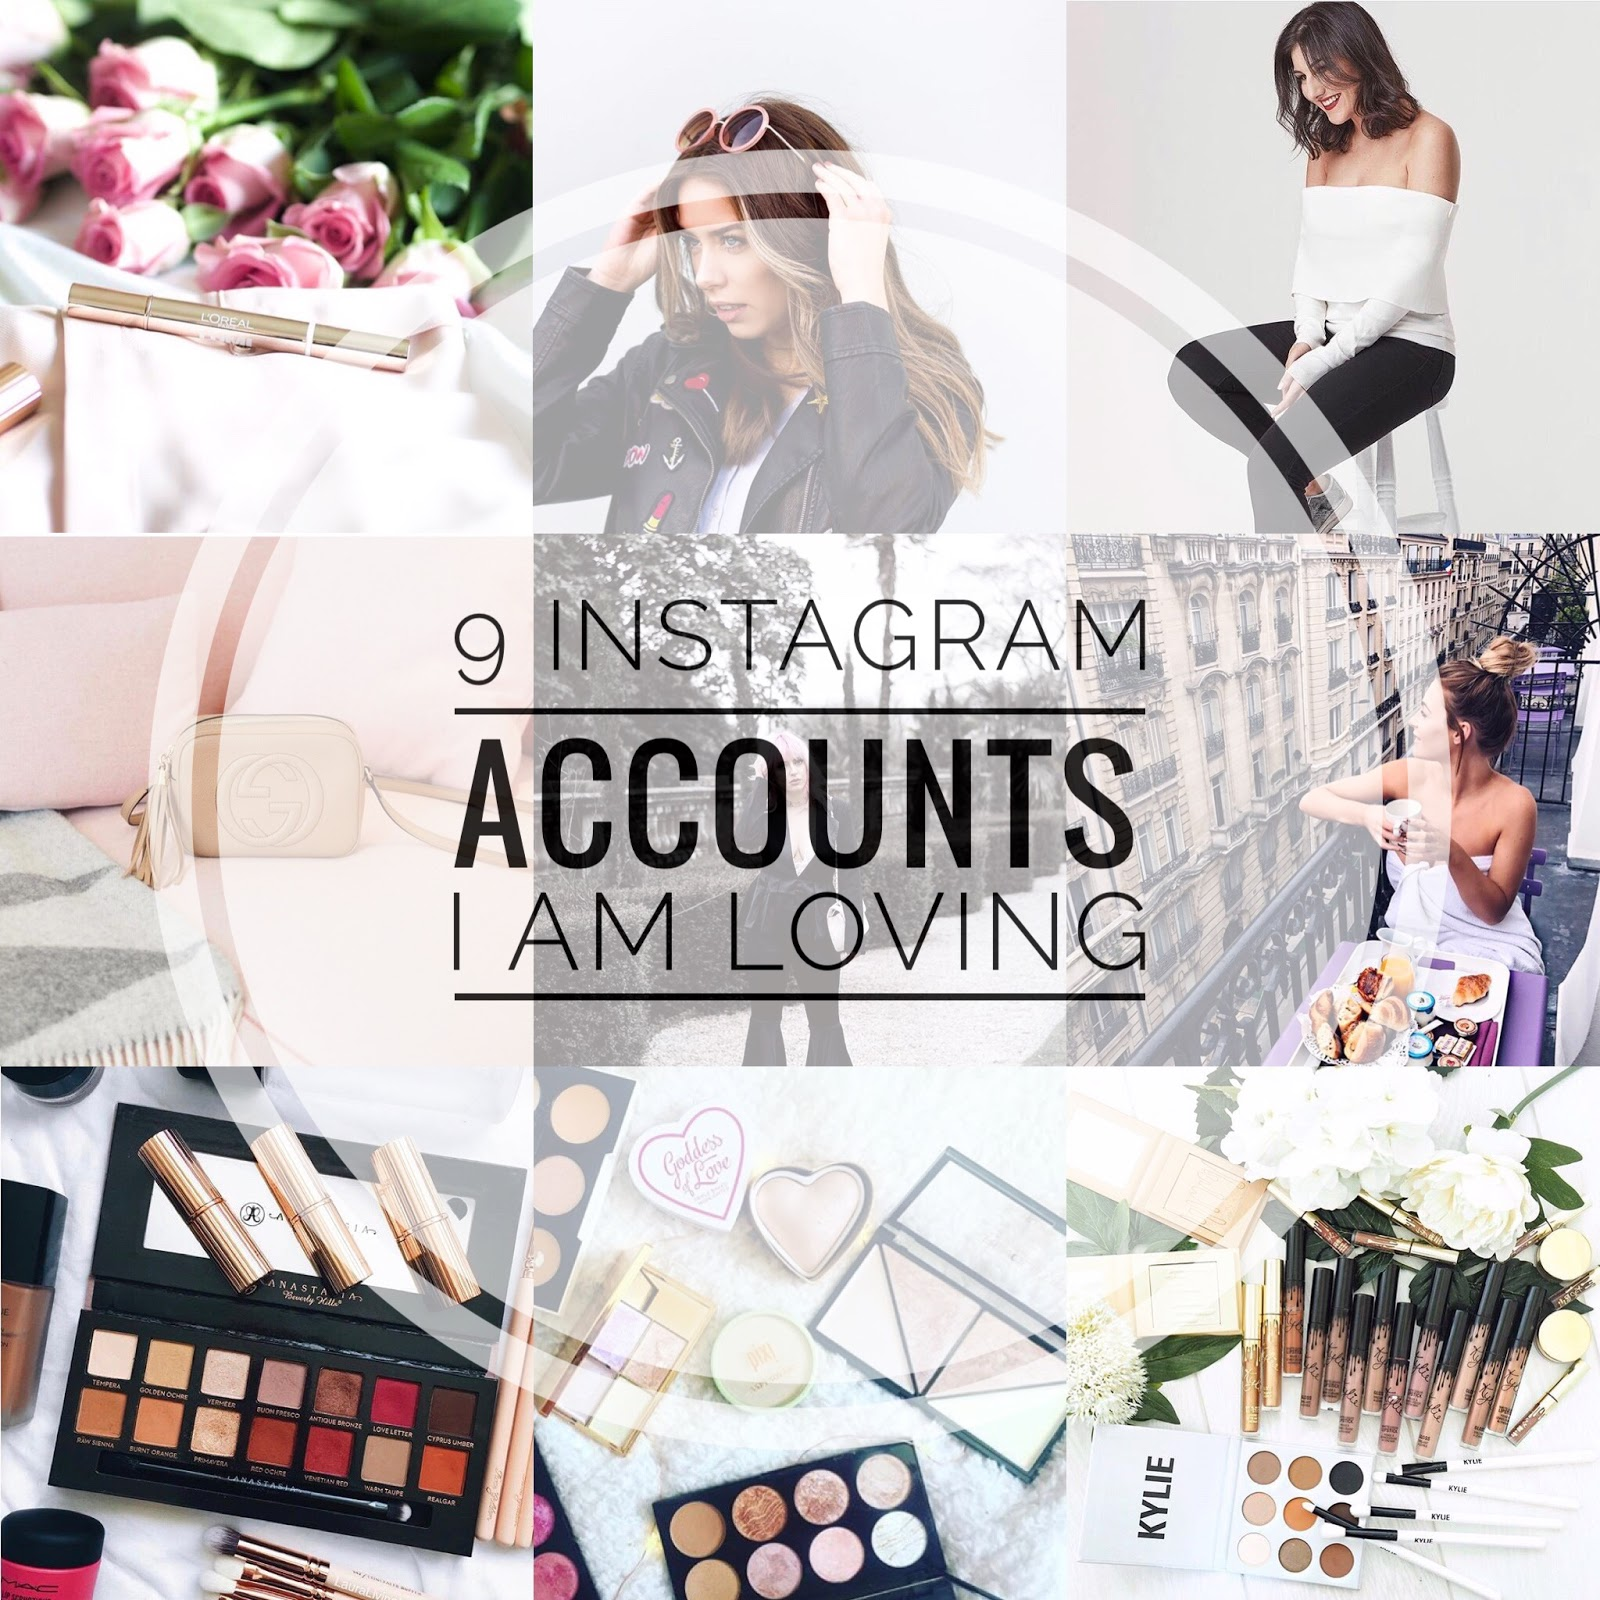 9 Instagram Accounts I Am Loving